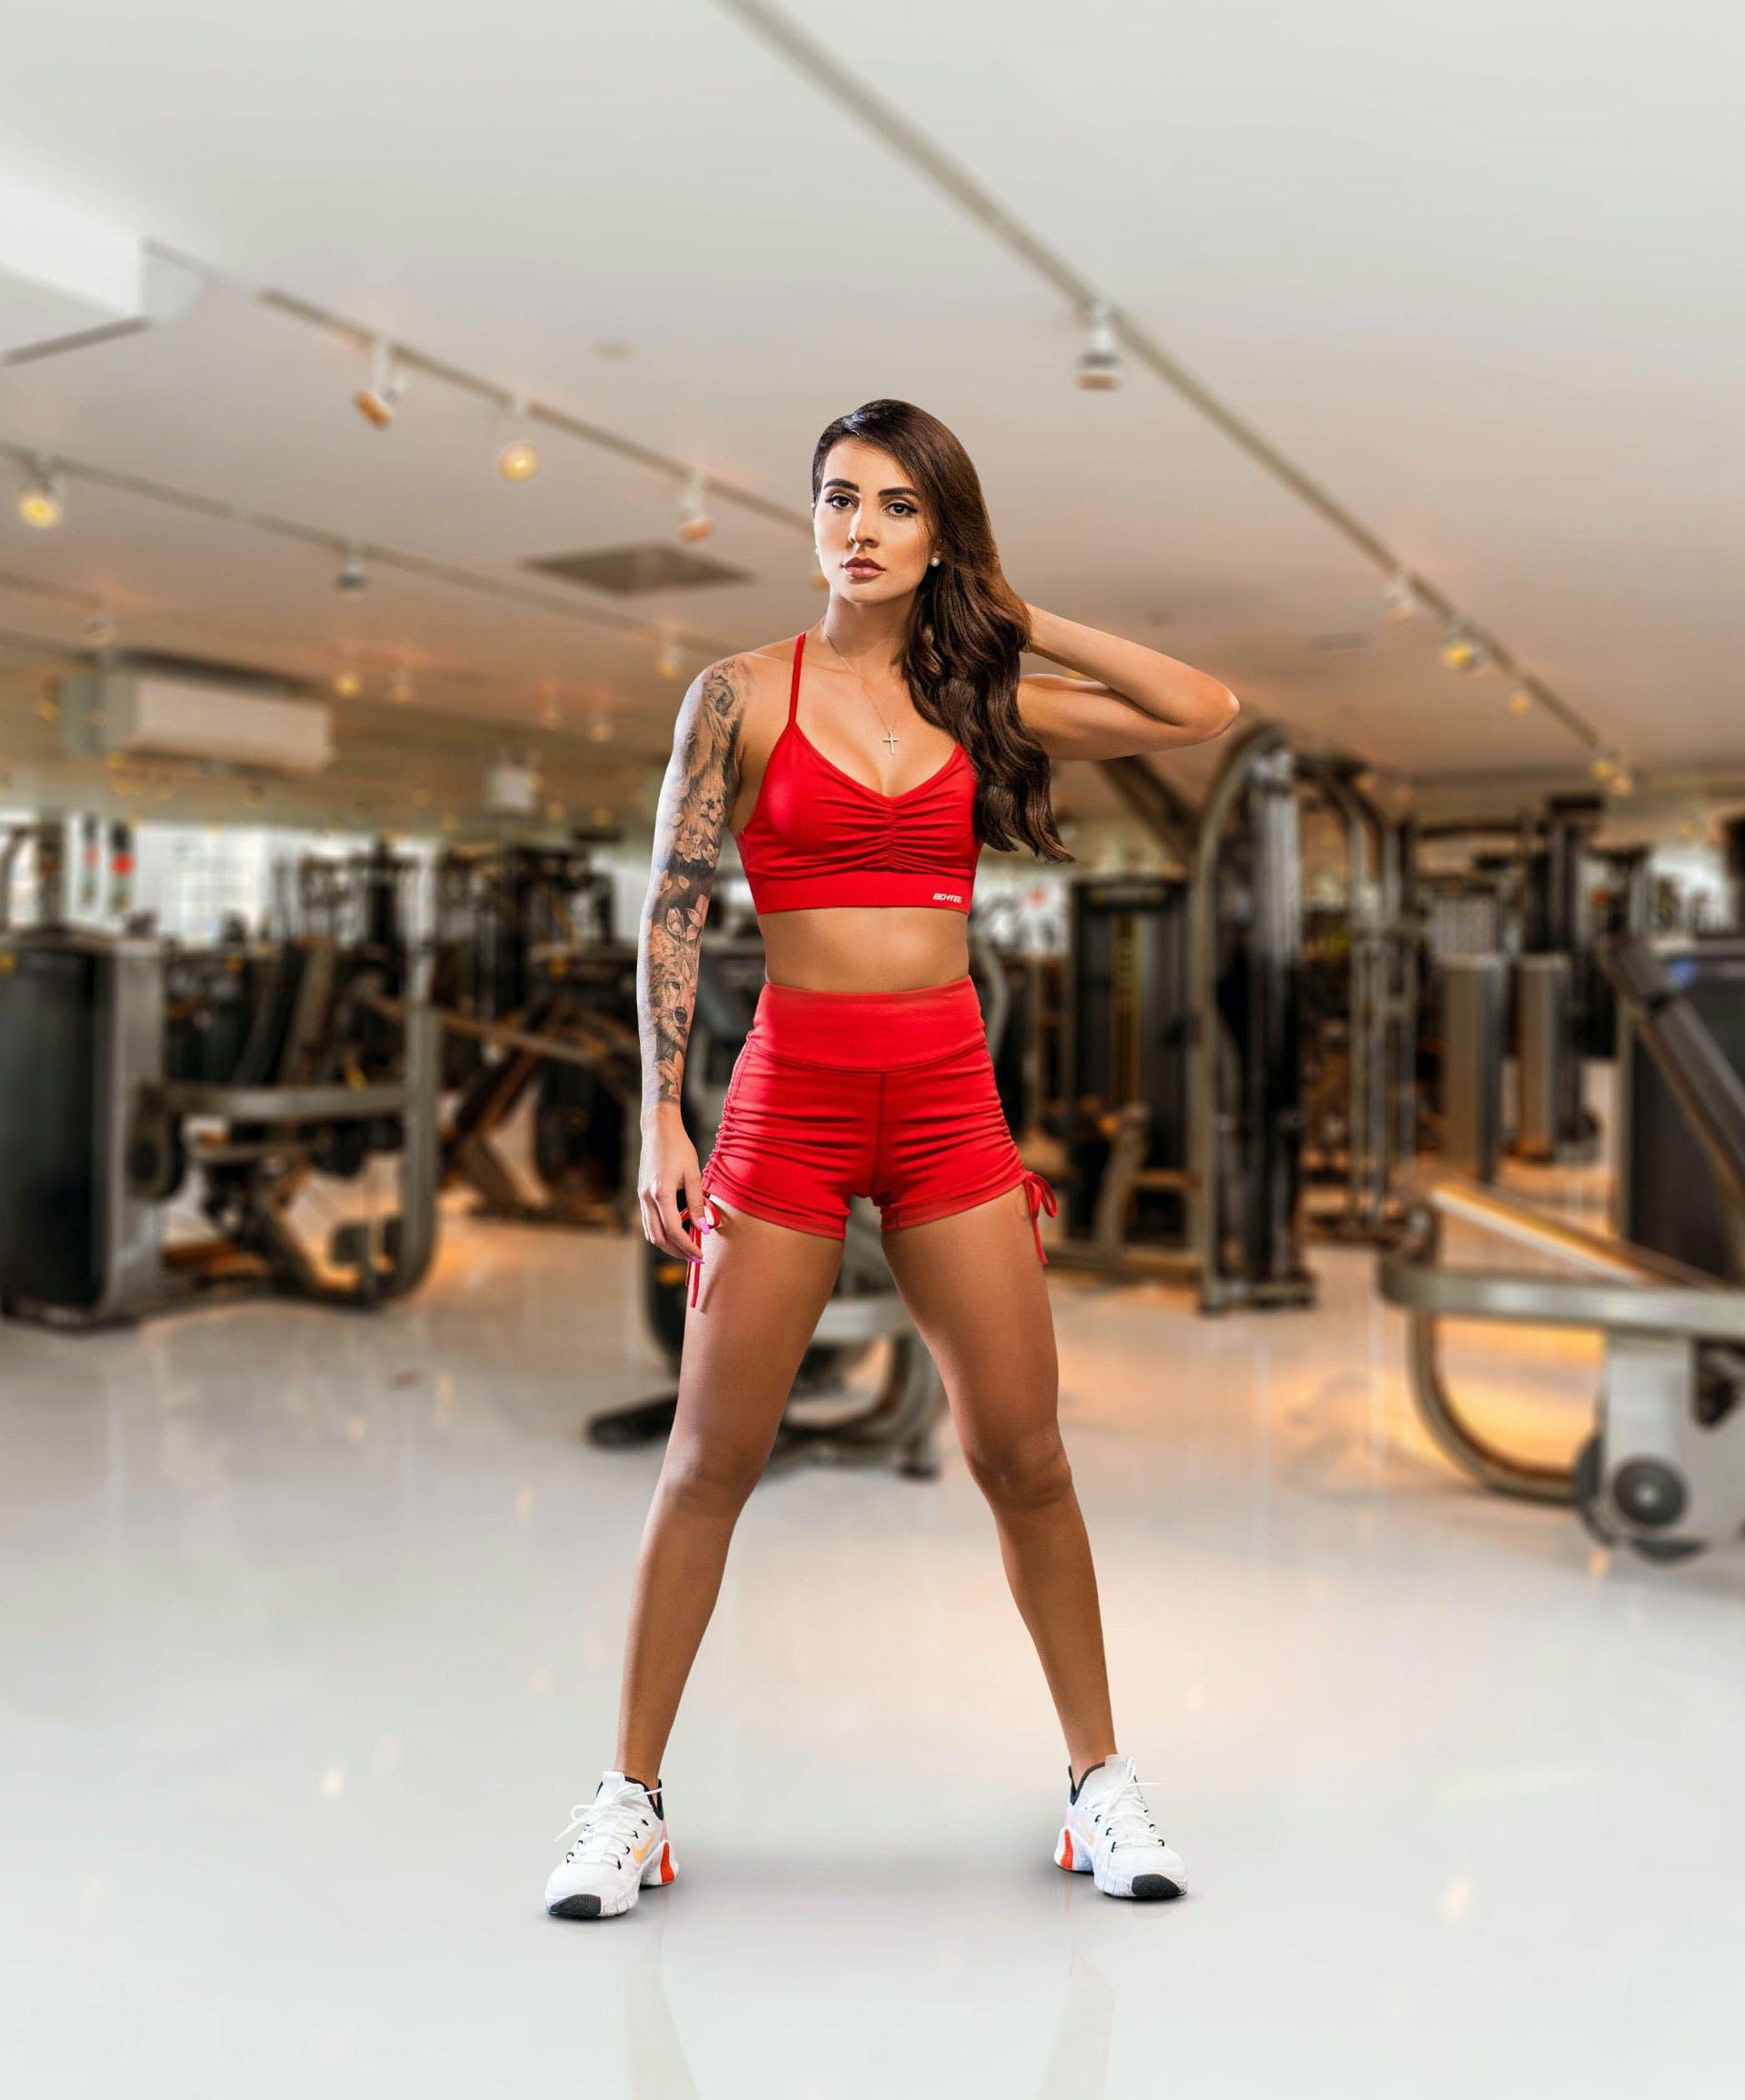 TMPL Fitness Clubs